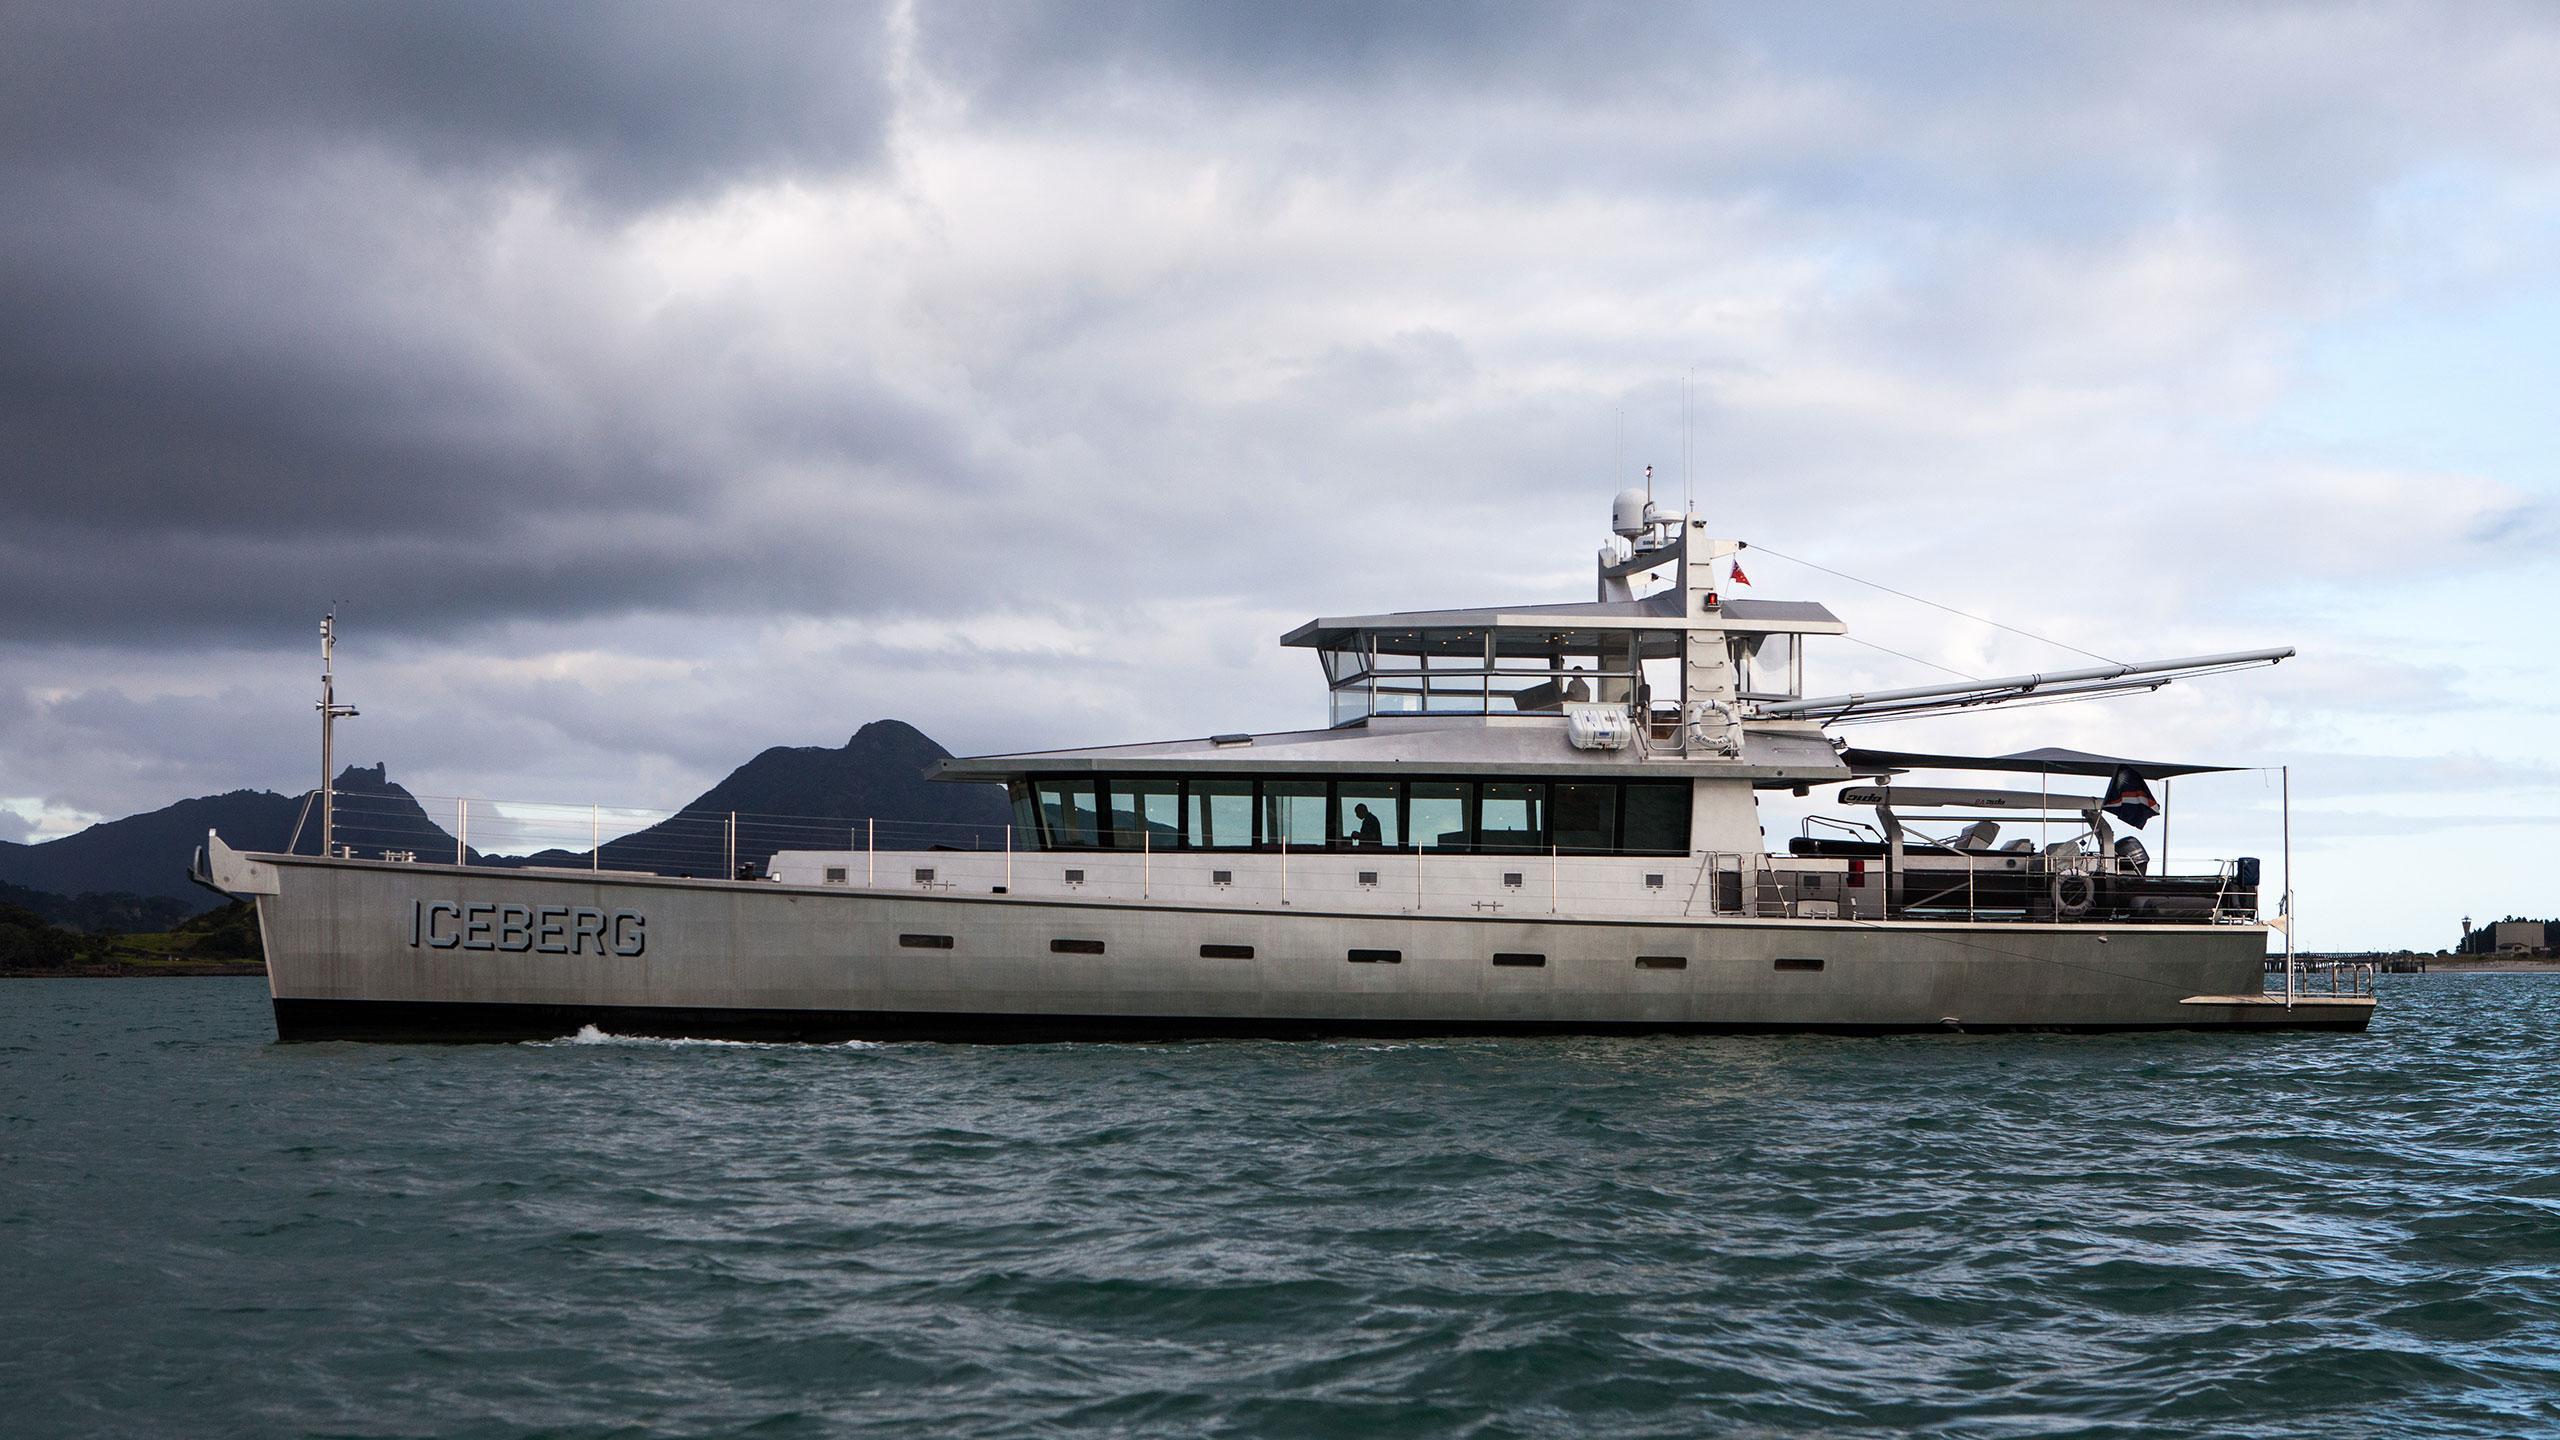 iceberg-motor-yacht-circa-marine-fpb-97-2015-34m-profile